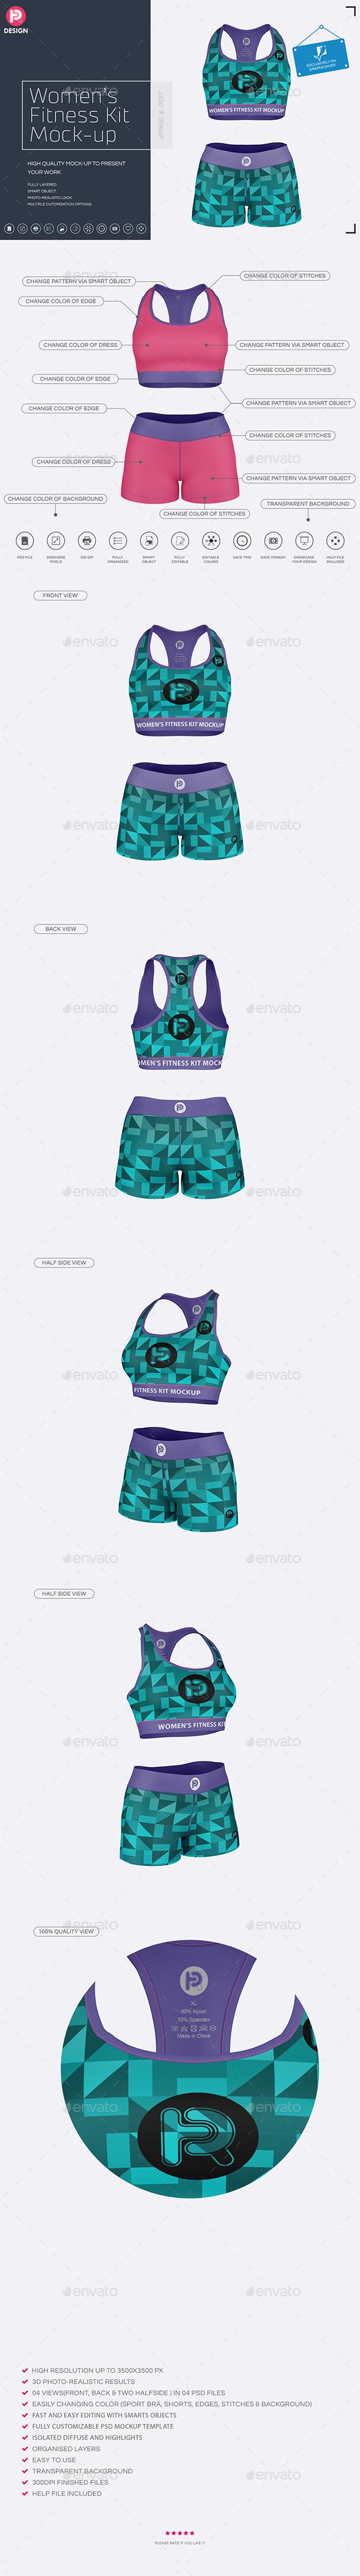 GraphicRiver Women's Fitness Kit Mock-Up v1 20716230